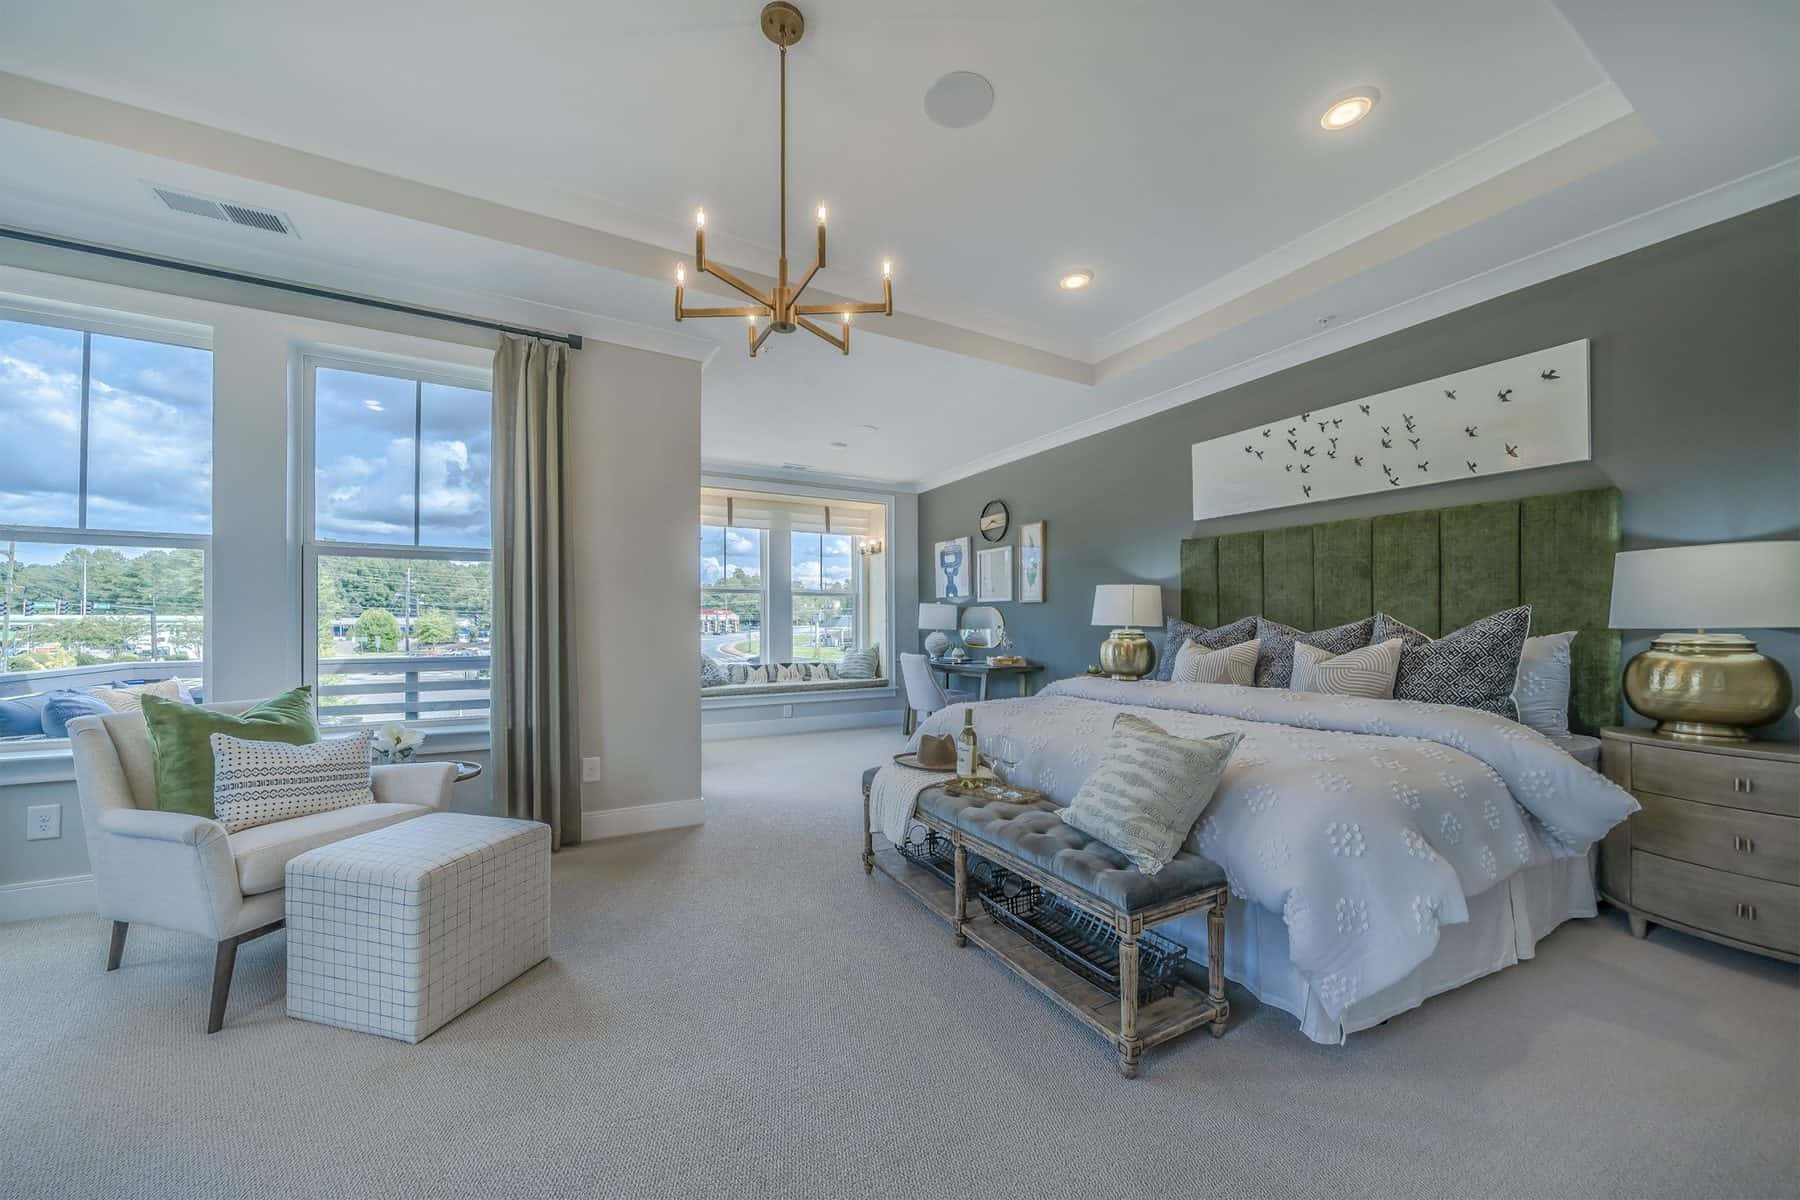 The Owners Retreat in the Model at David Weekley Homes Ellison Park in Sandy Springs